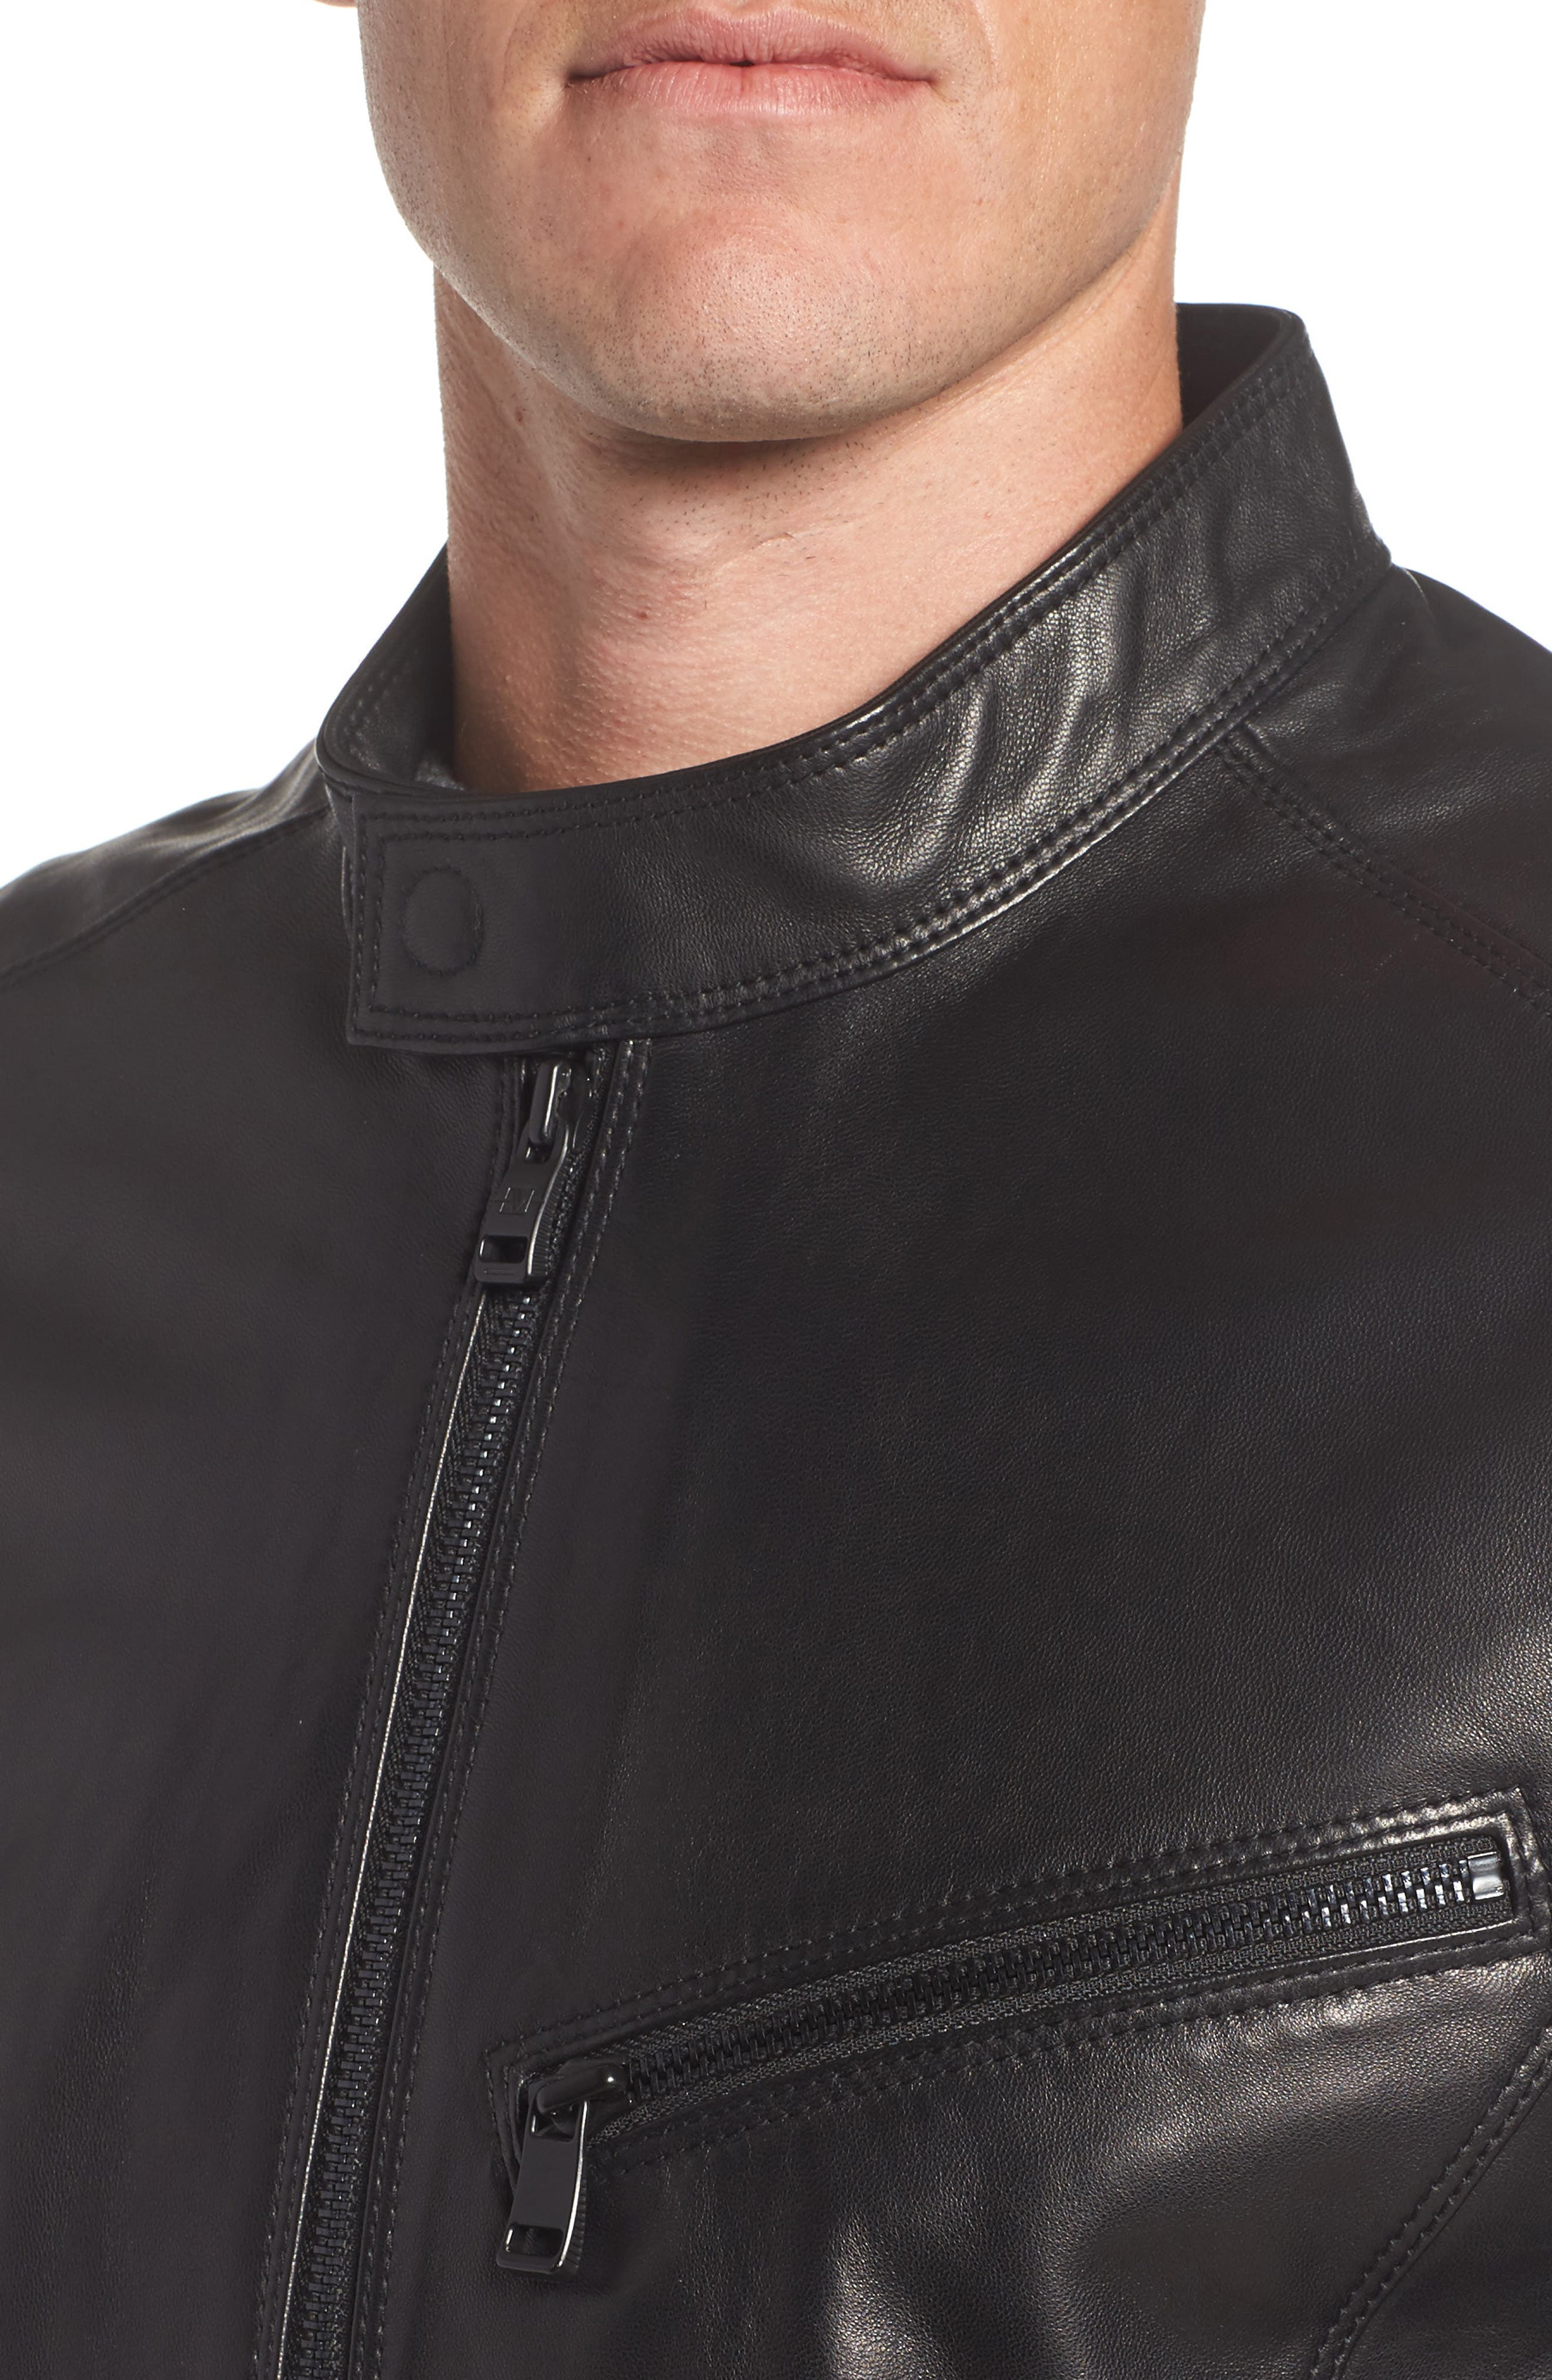 Gibson Slim Leather Moto Jacket,                             Alternate thumbnail 4, color,                             001